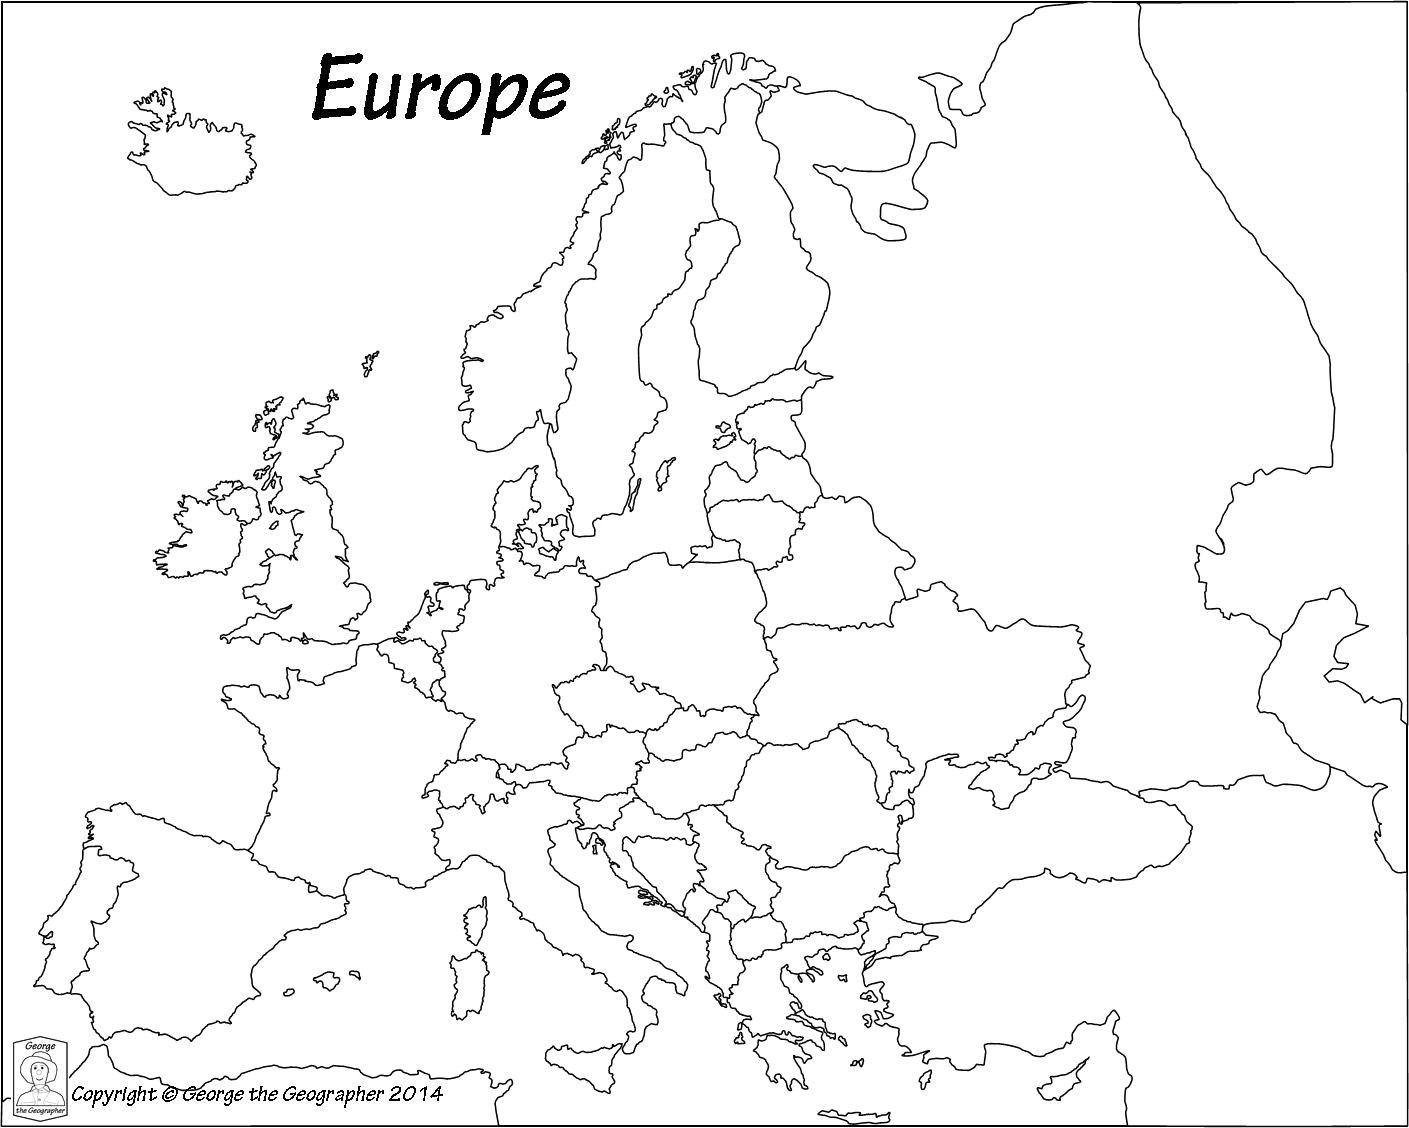 Europe Unlabeled Map Telene Me And Of Black White